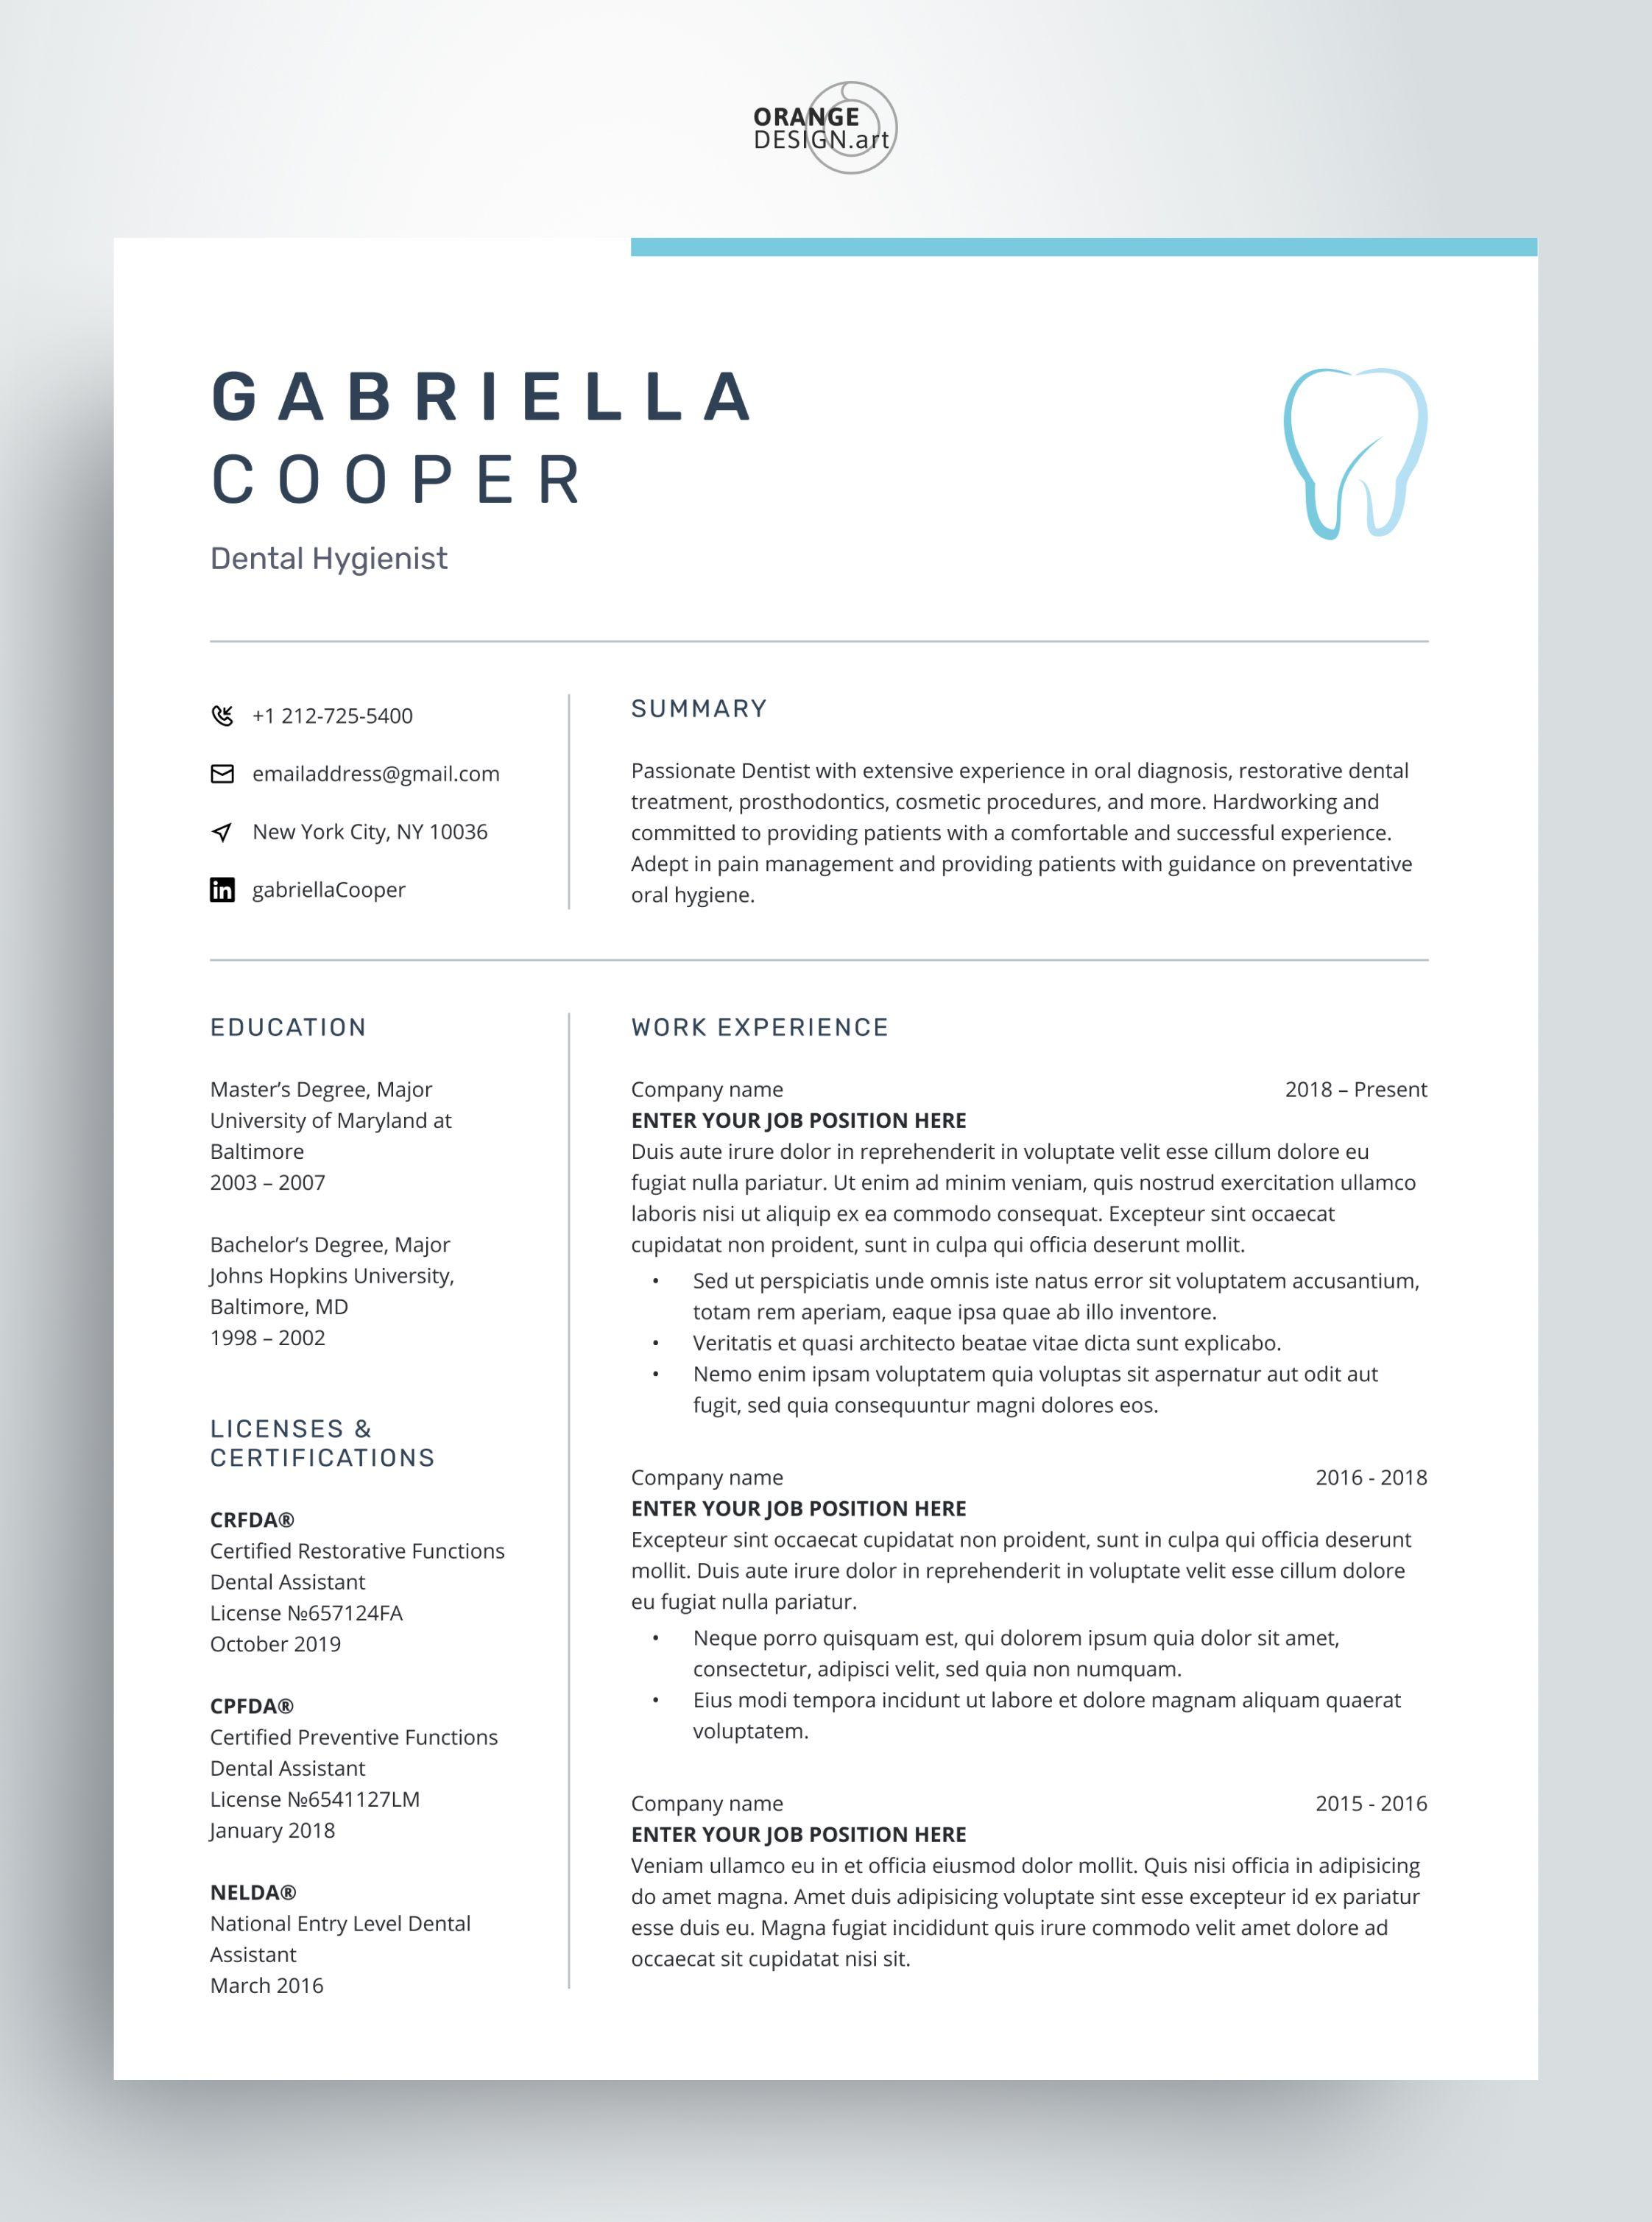 Medical Cv Template For Word Modern Resume Template Dentist Dental Cv Template Receptionist Resume Template 2020 Nursing Resume Guide Microsoft Word Resume Template Modern Resume Template Cv Template - ms word resume template 2007